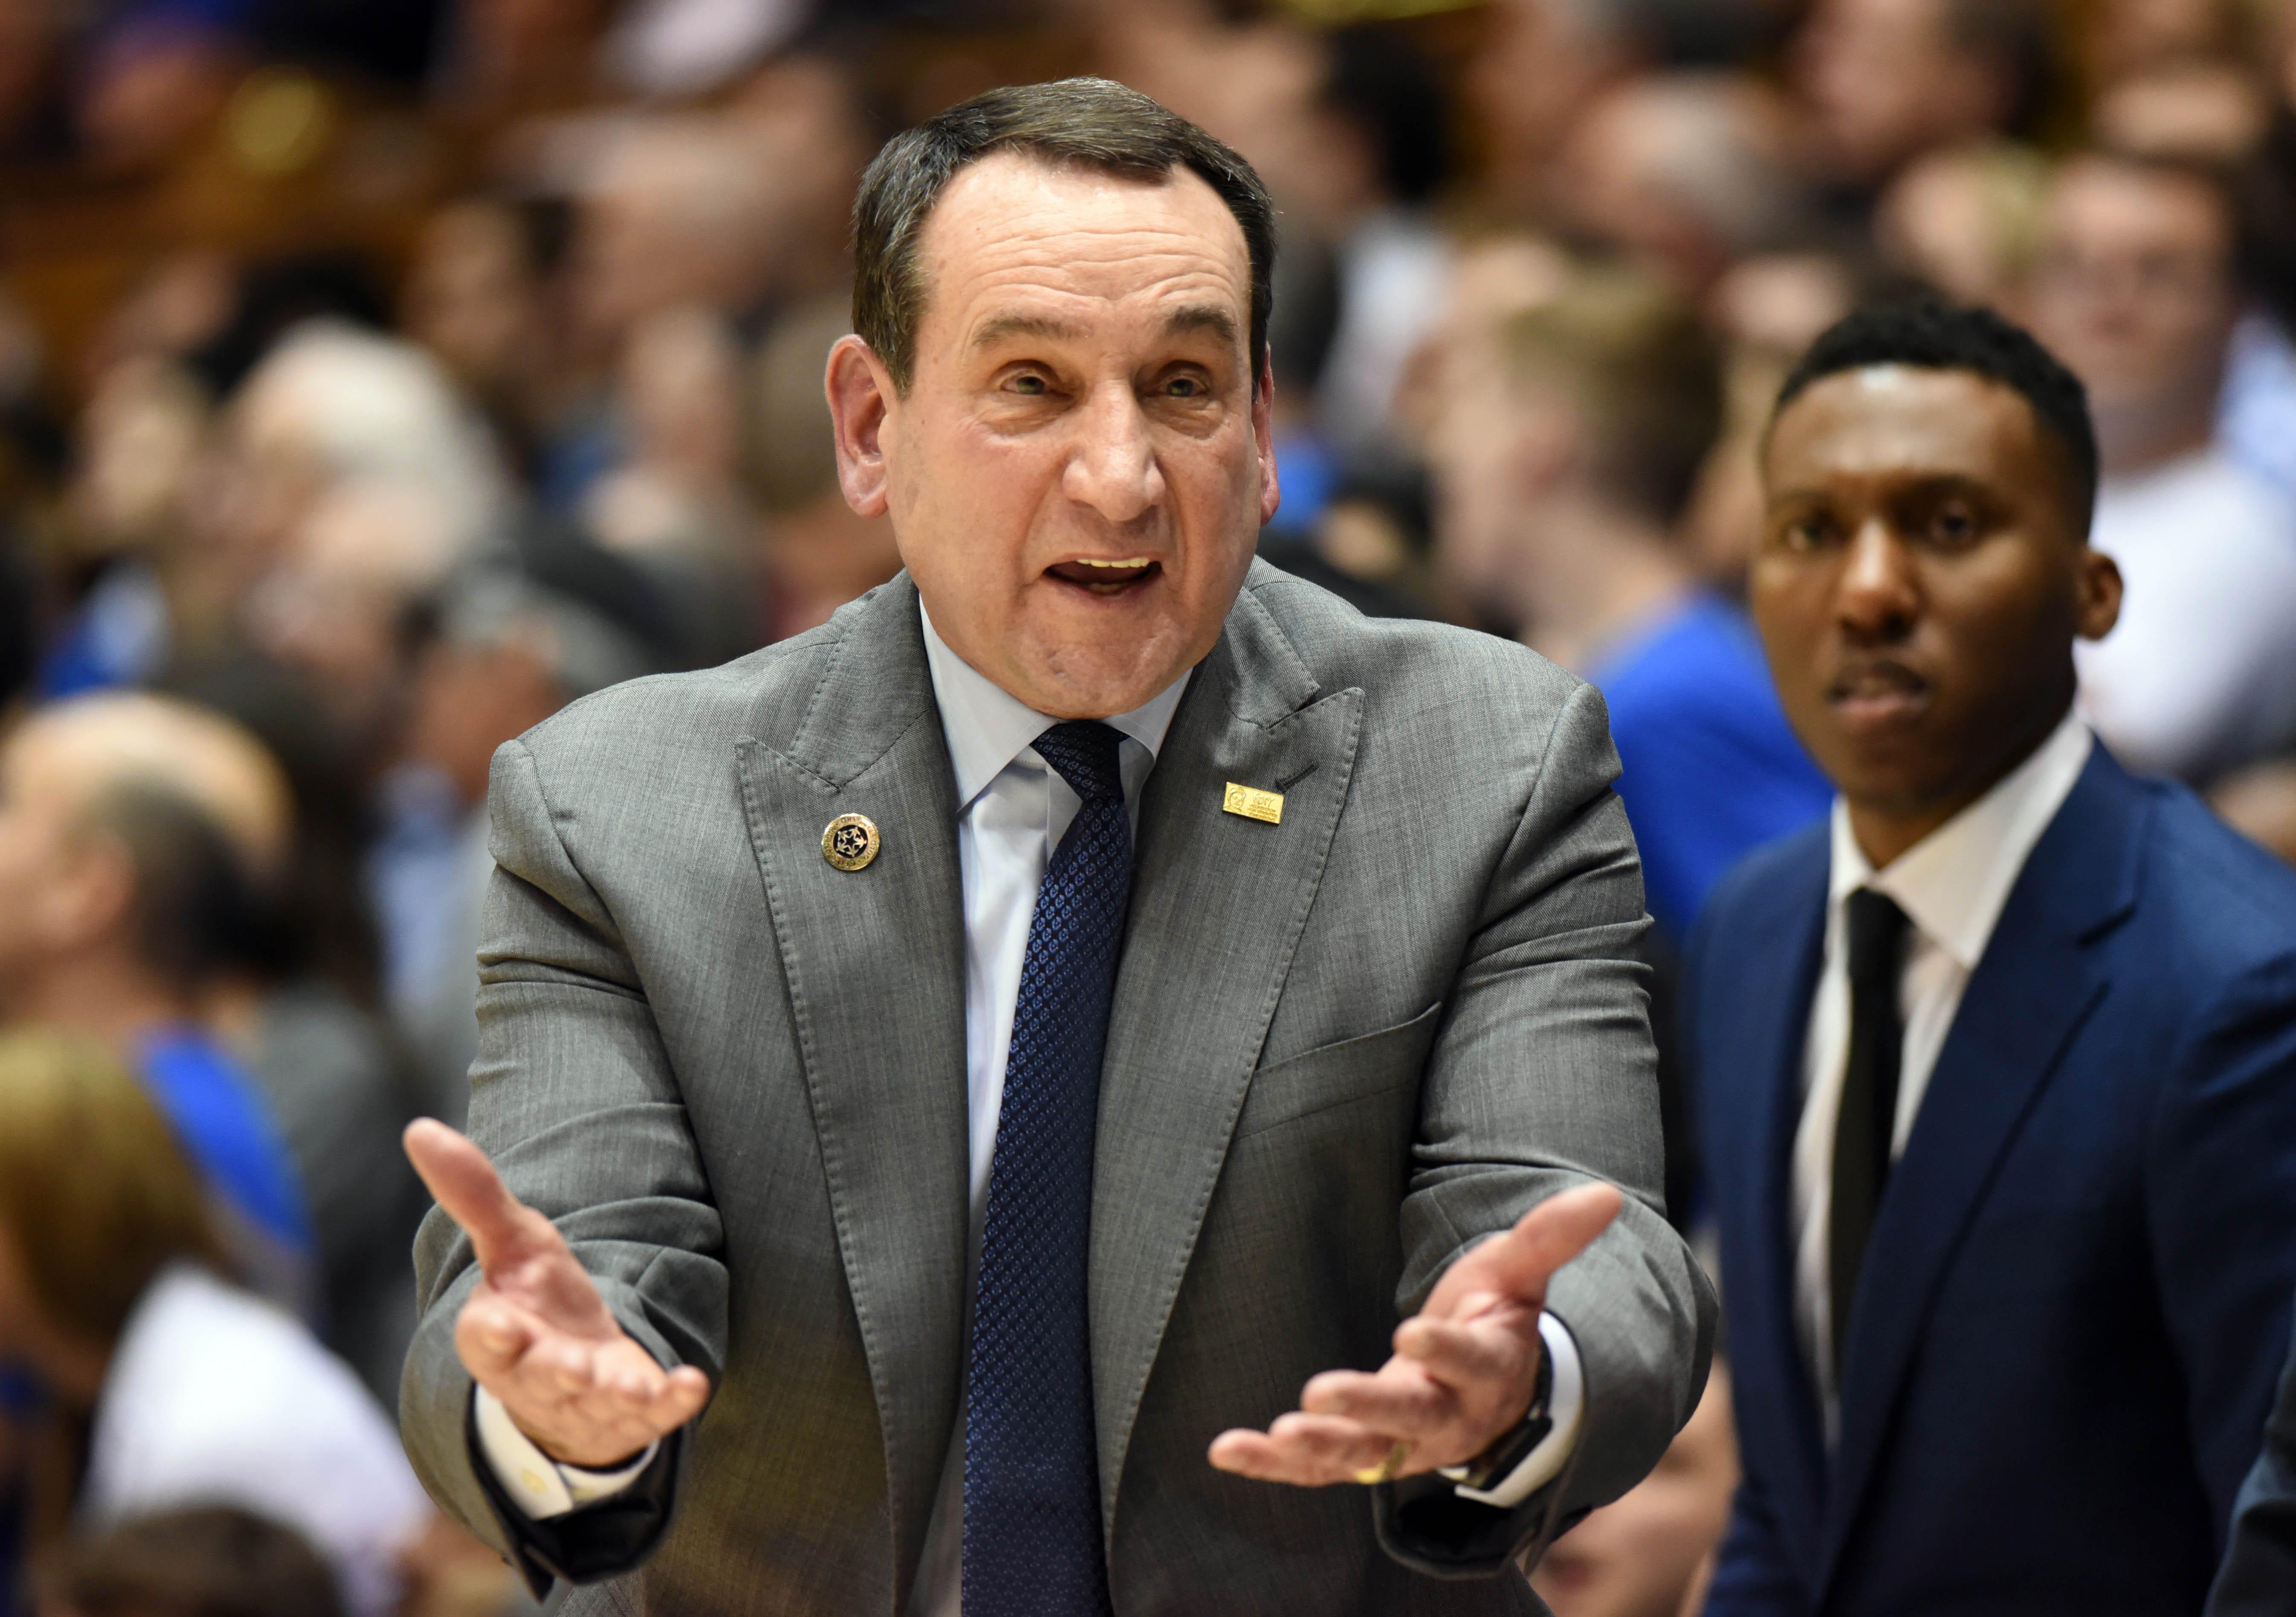 Report: Duke men's basketball coach Mike Krzyzewski, 'Coach K,' will retire after upcoming season